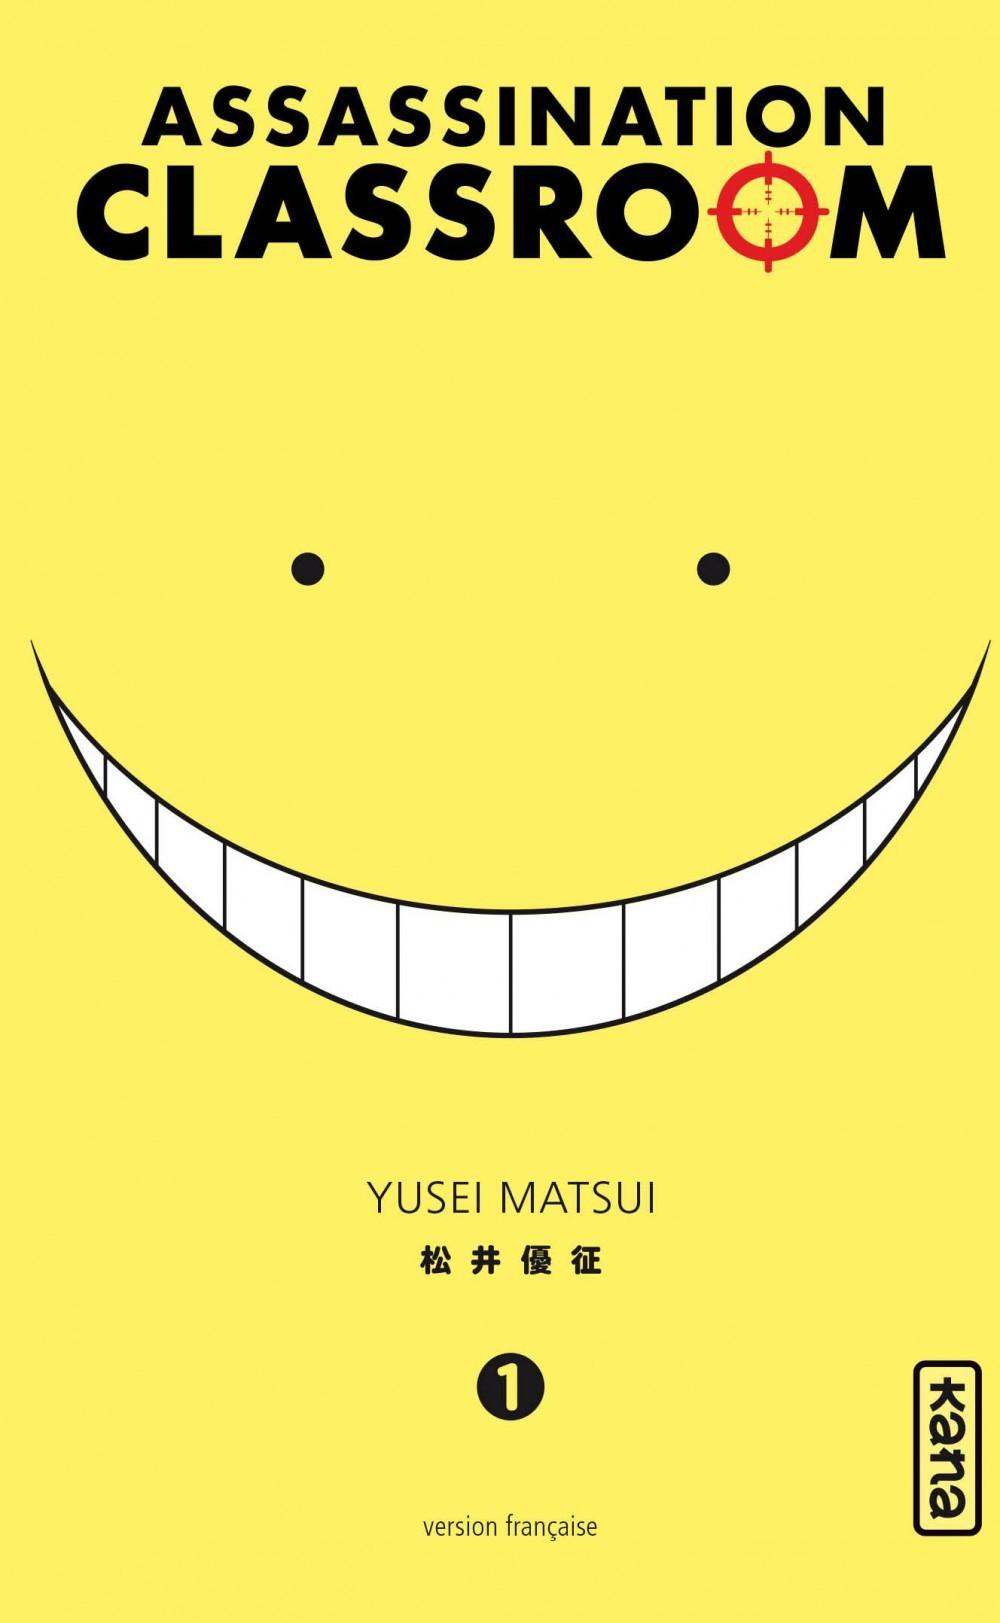 Assassination Classroom manga cover